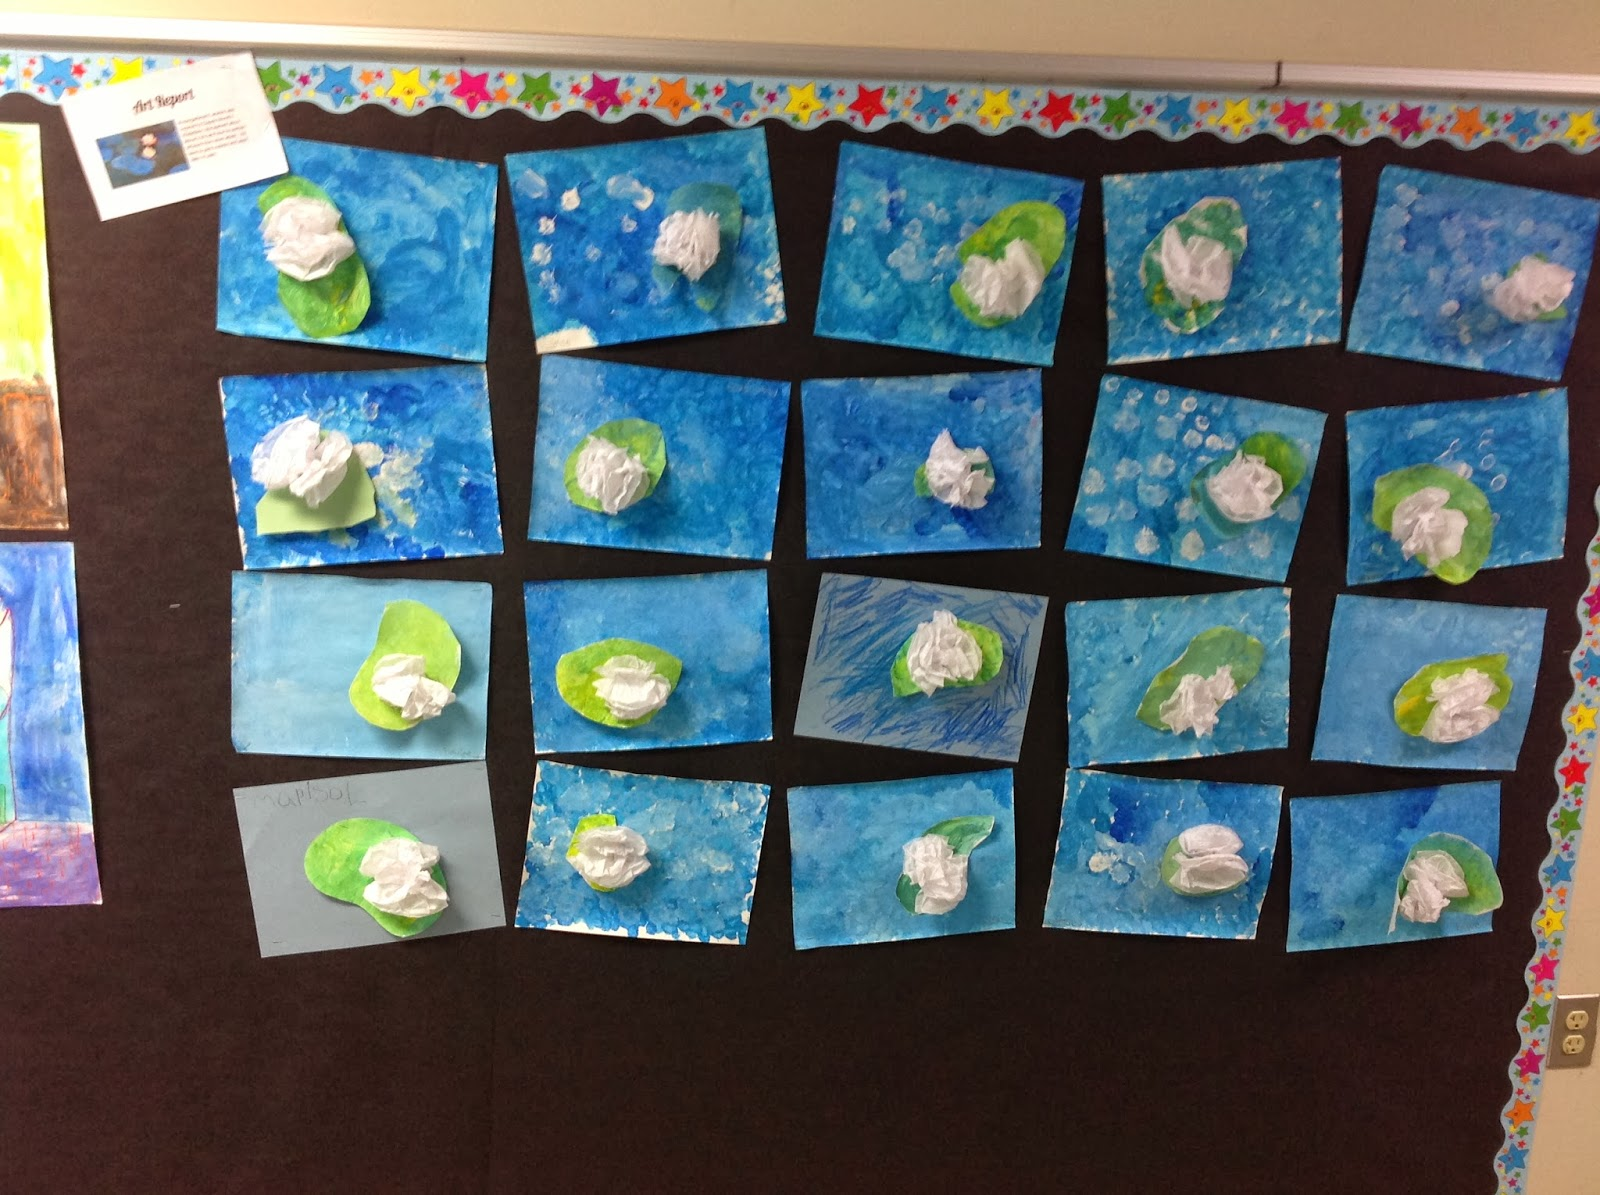 Nicole Caulfield Fine Art: Some Elementary Art Lessons